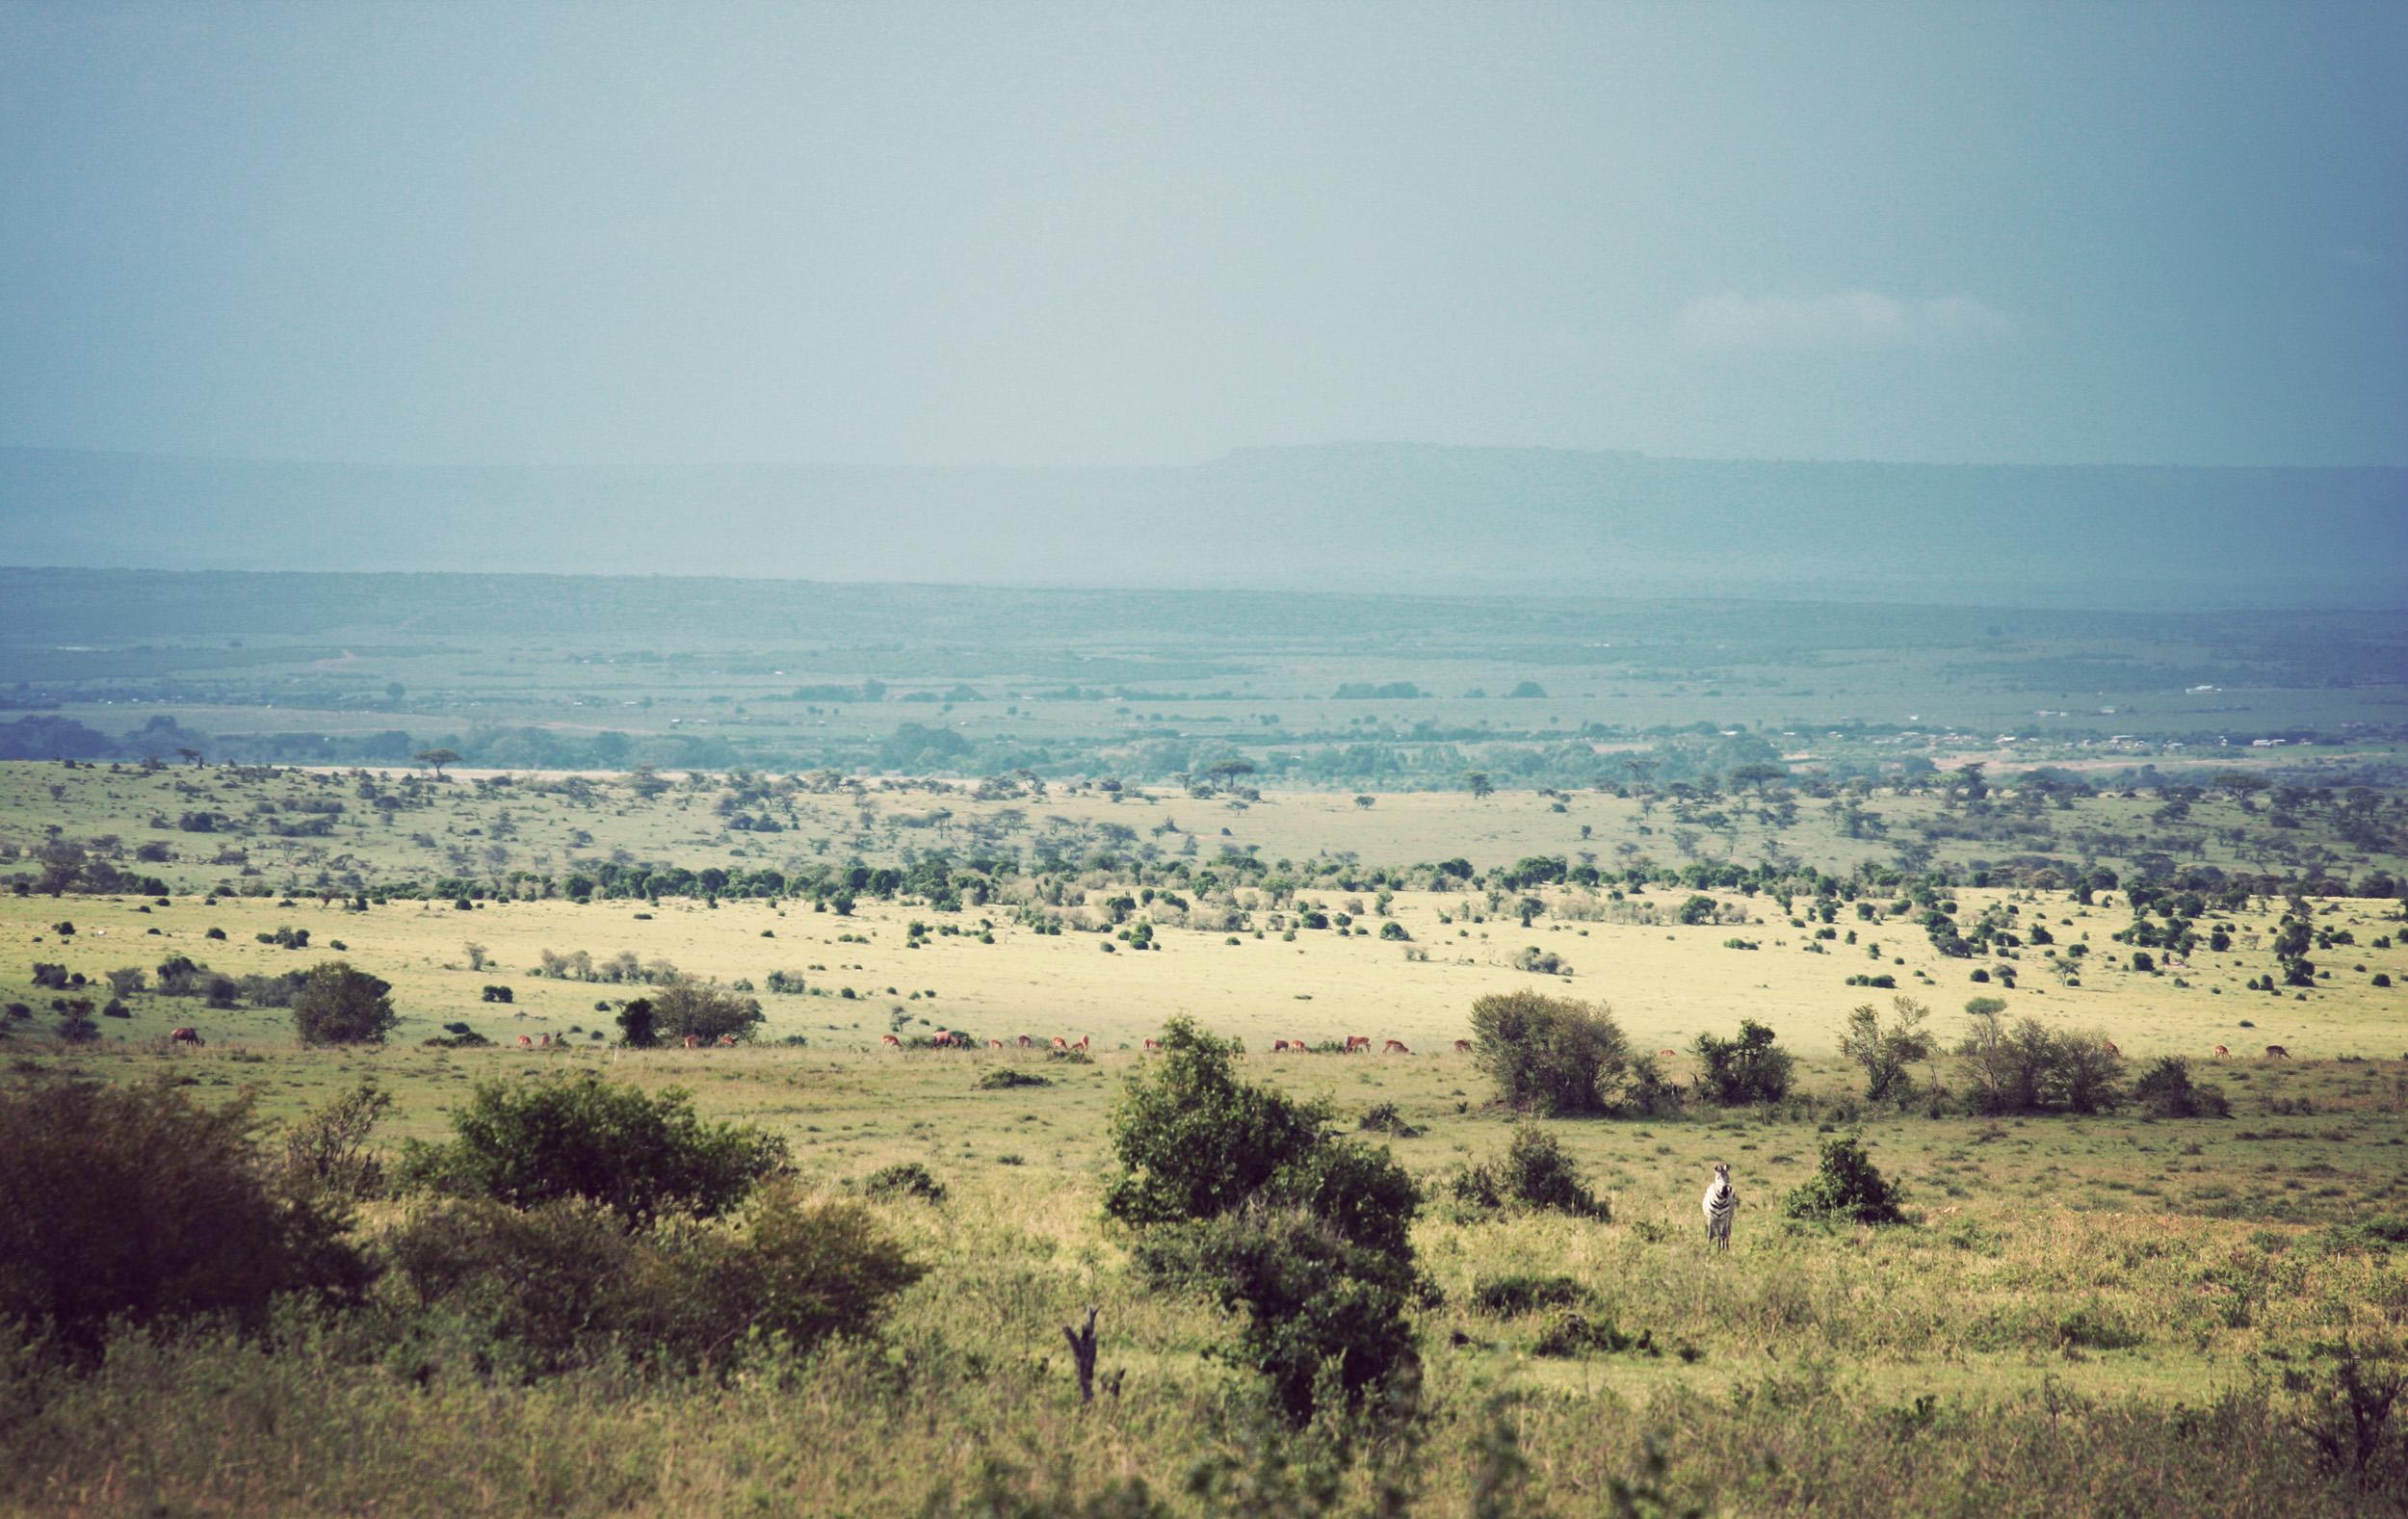 Maasai Mara - because mara means 'spotted' landscape.